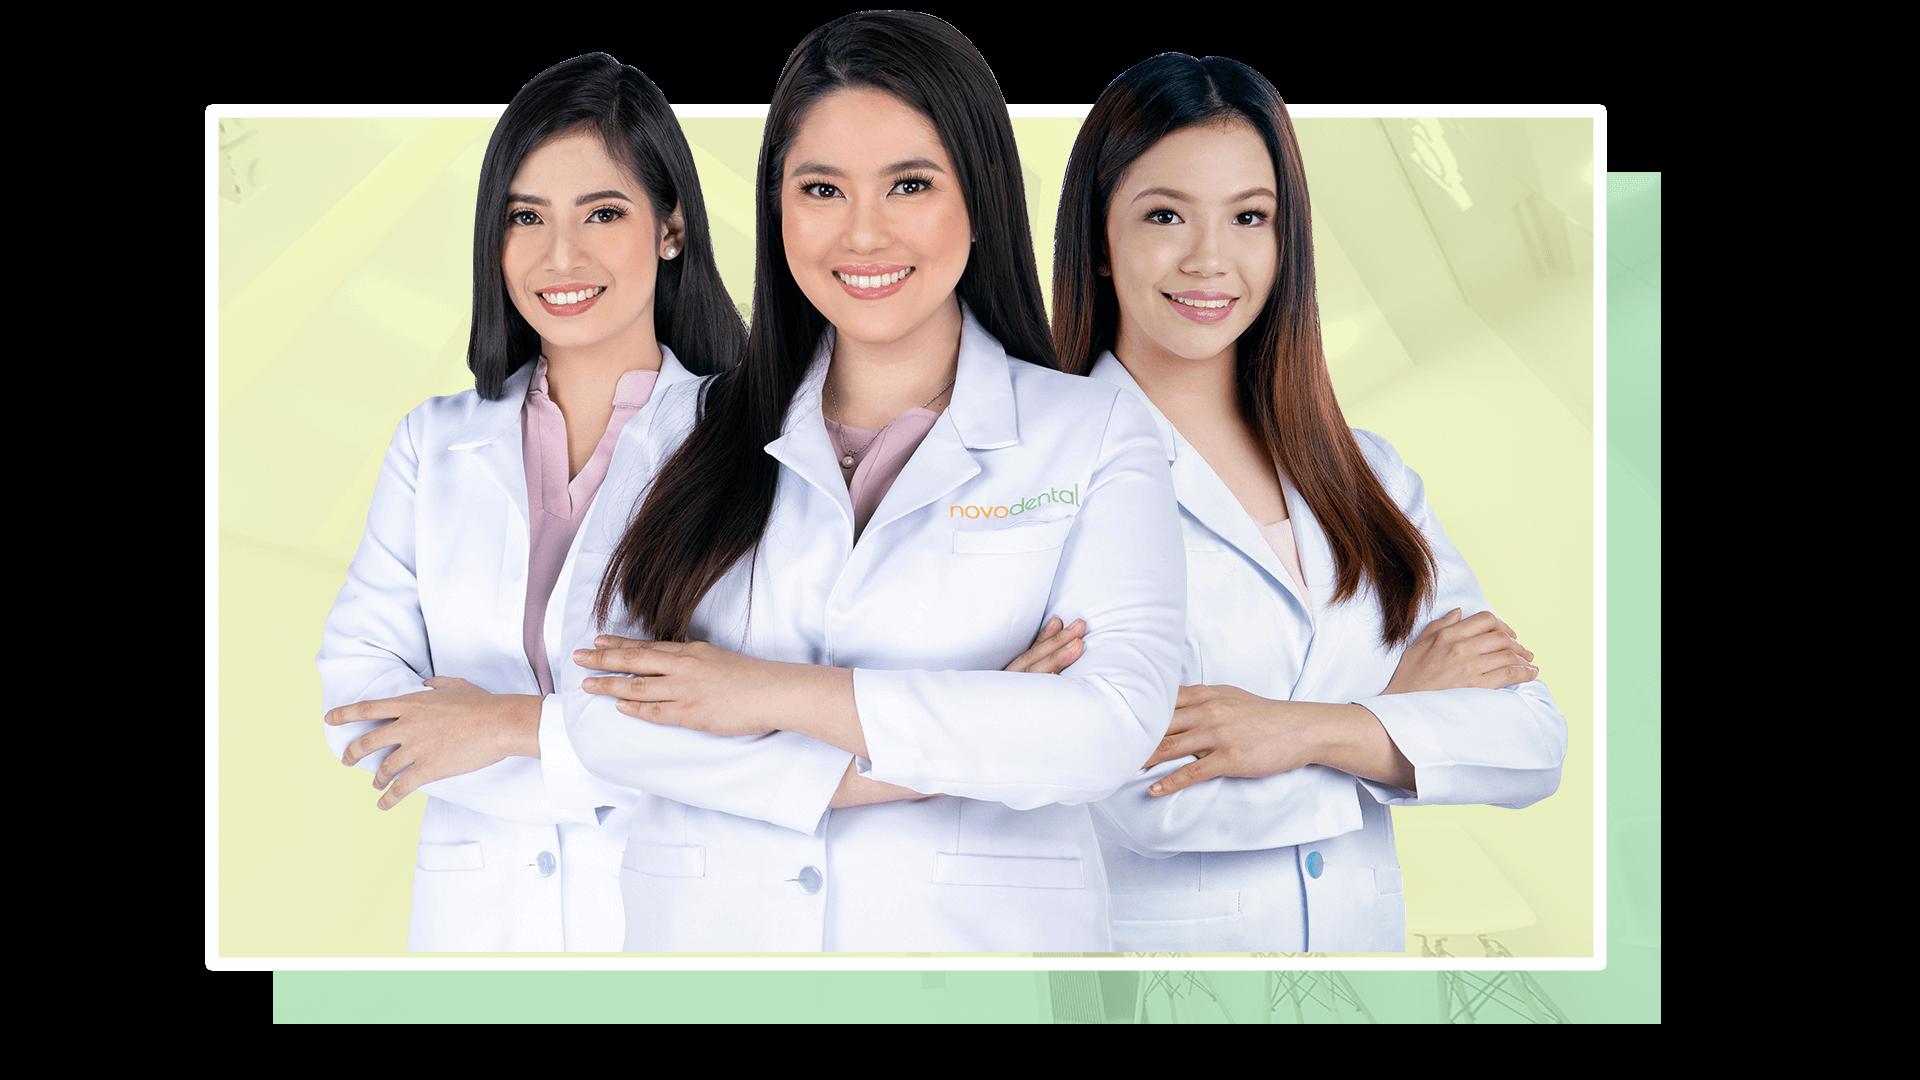 Novodental dentists